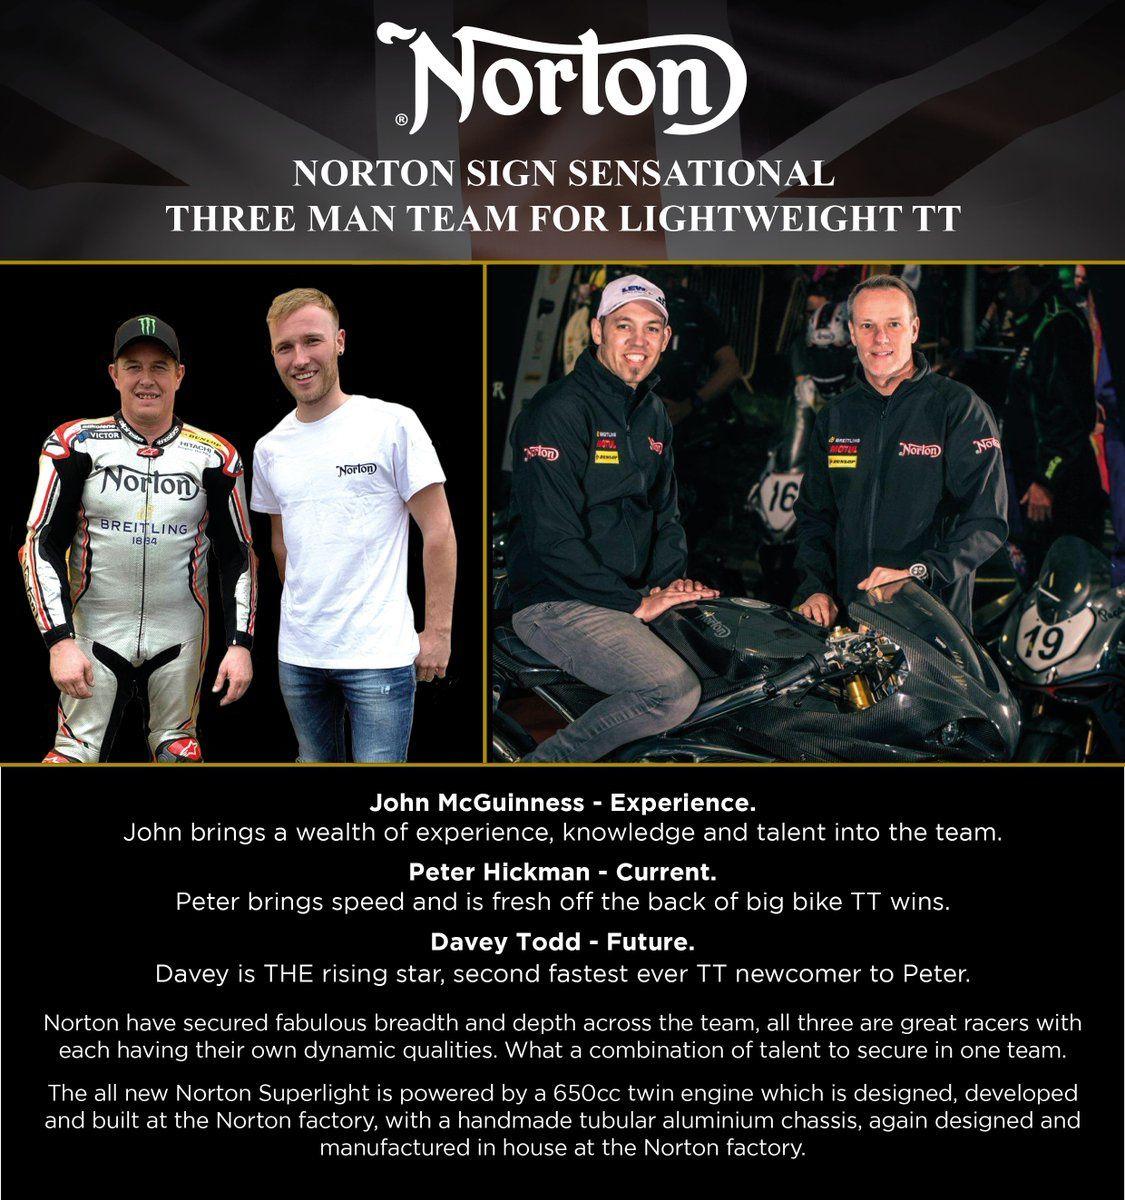 Norton aligne une dream team en supertwin